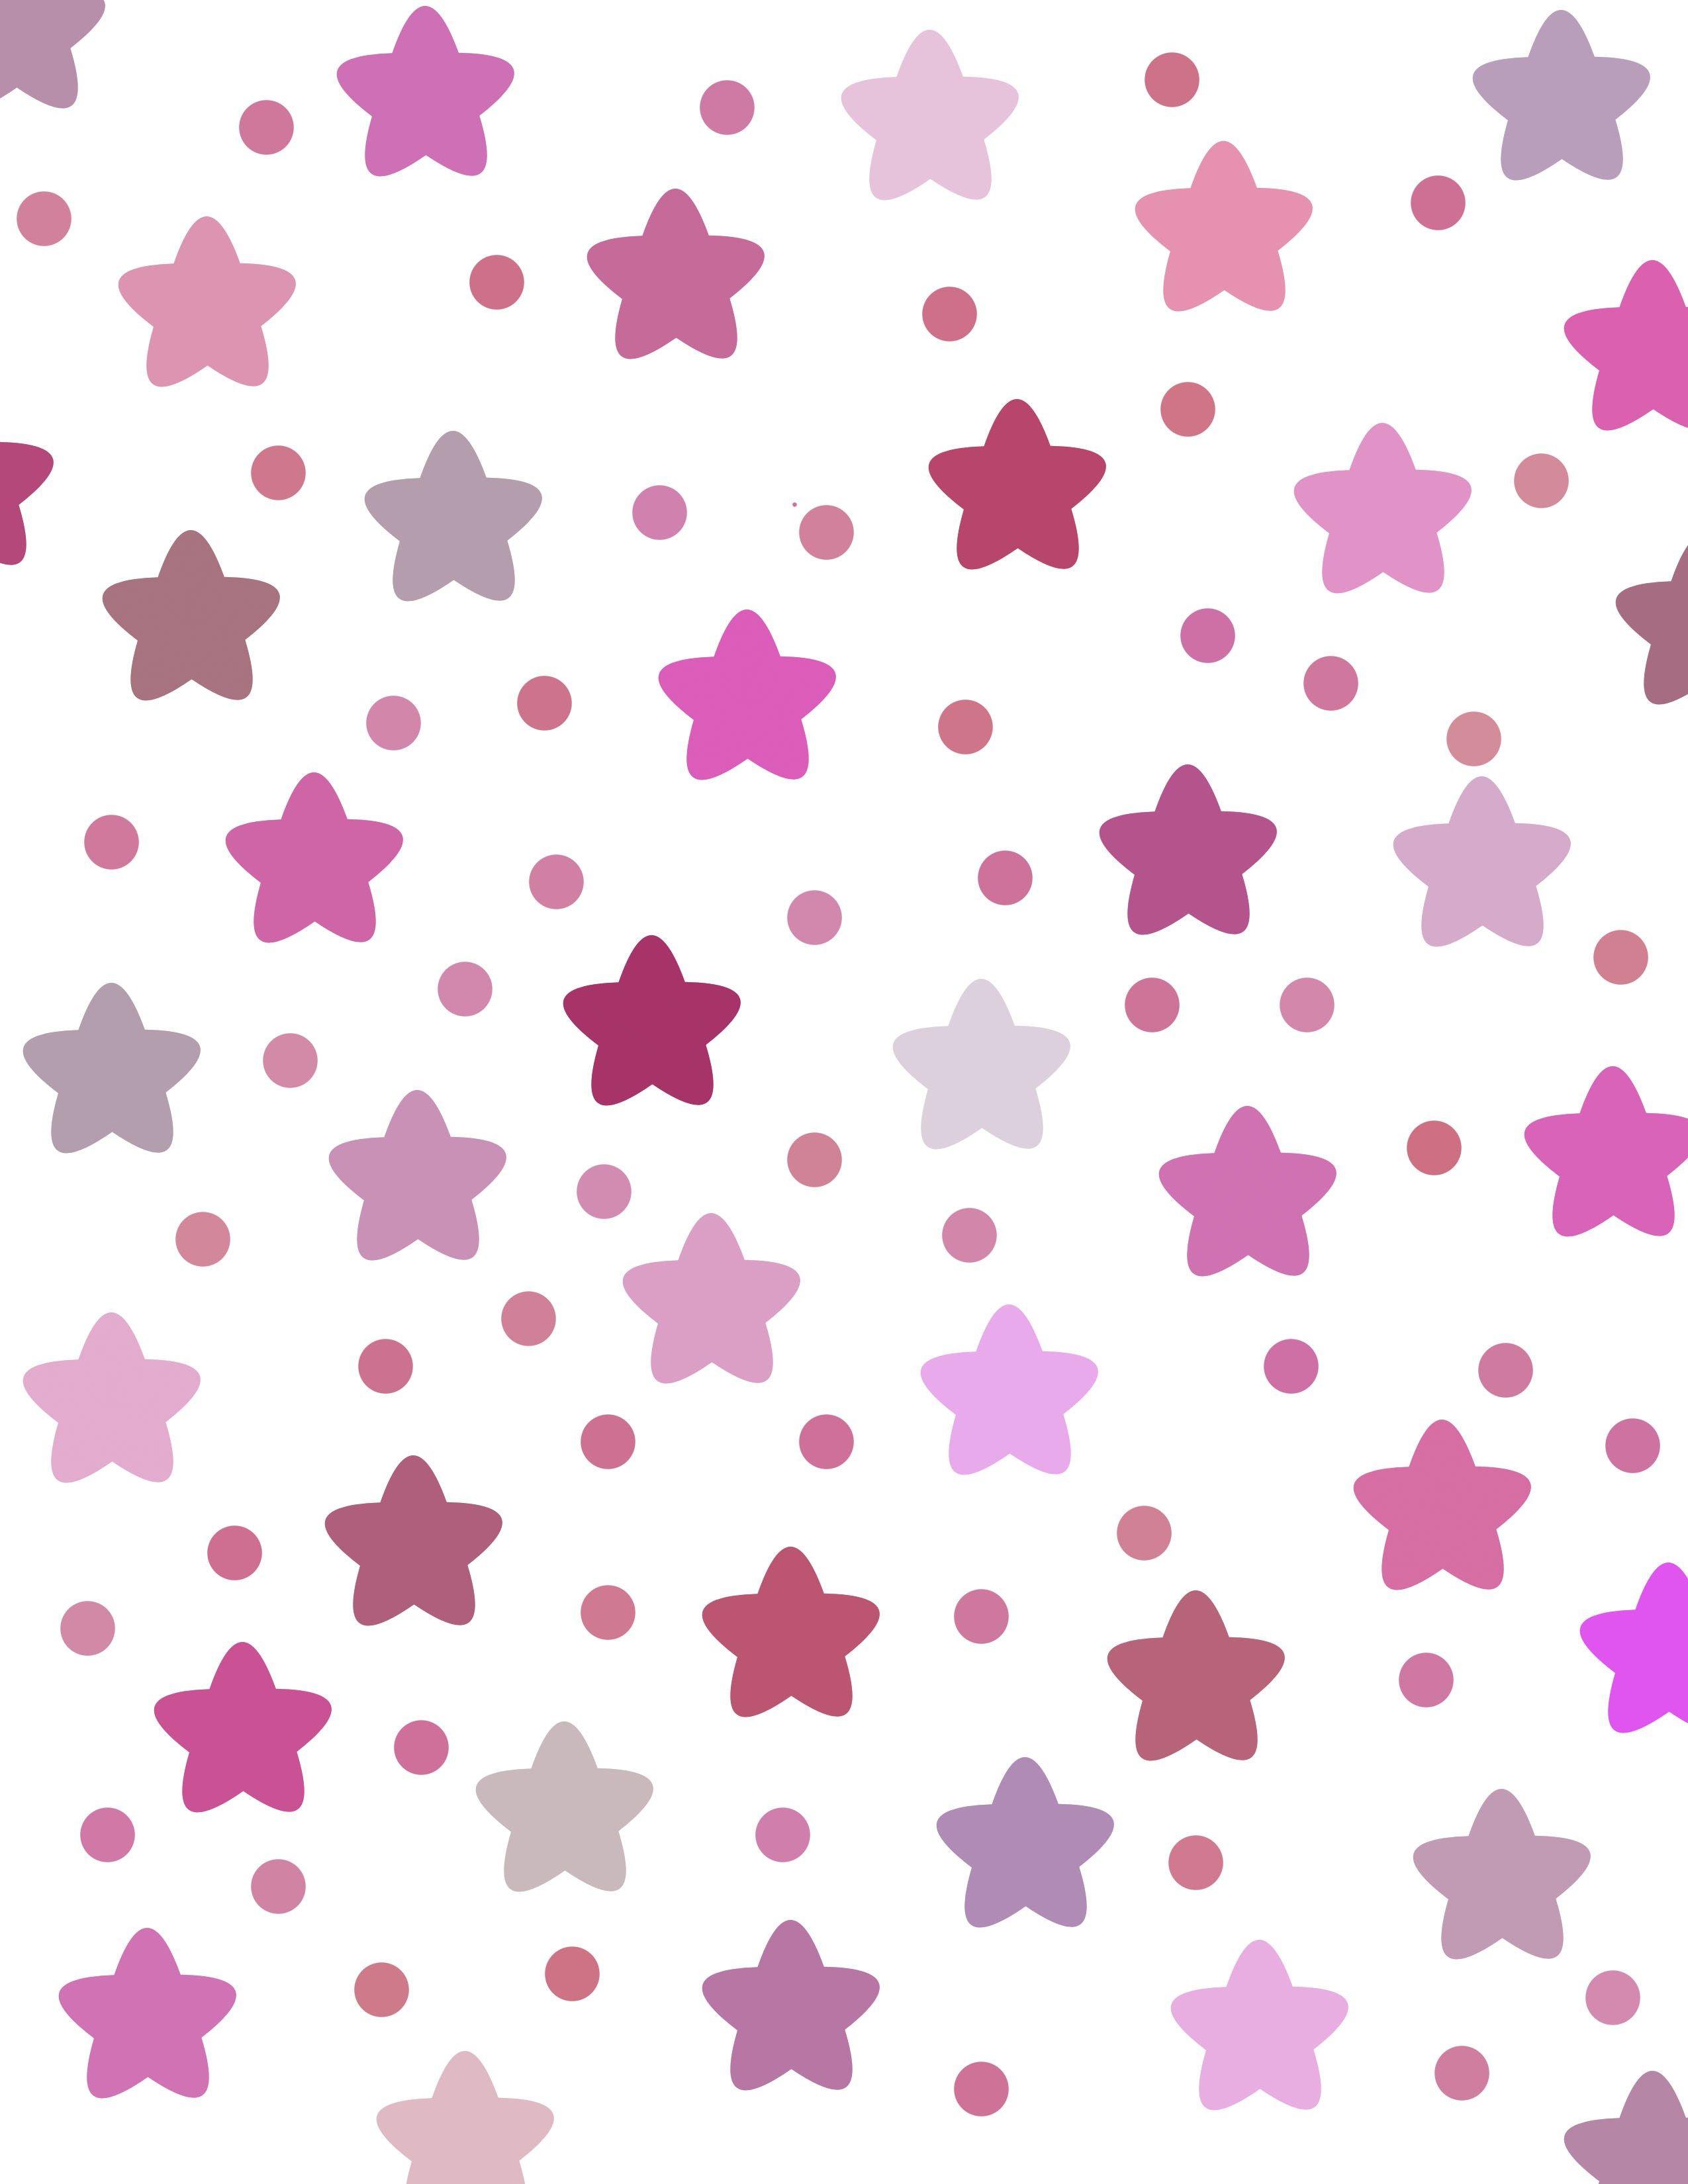 Papel estampado Pattern Papel estampado Pattern